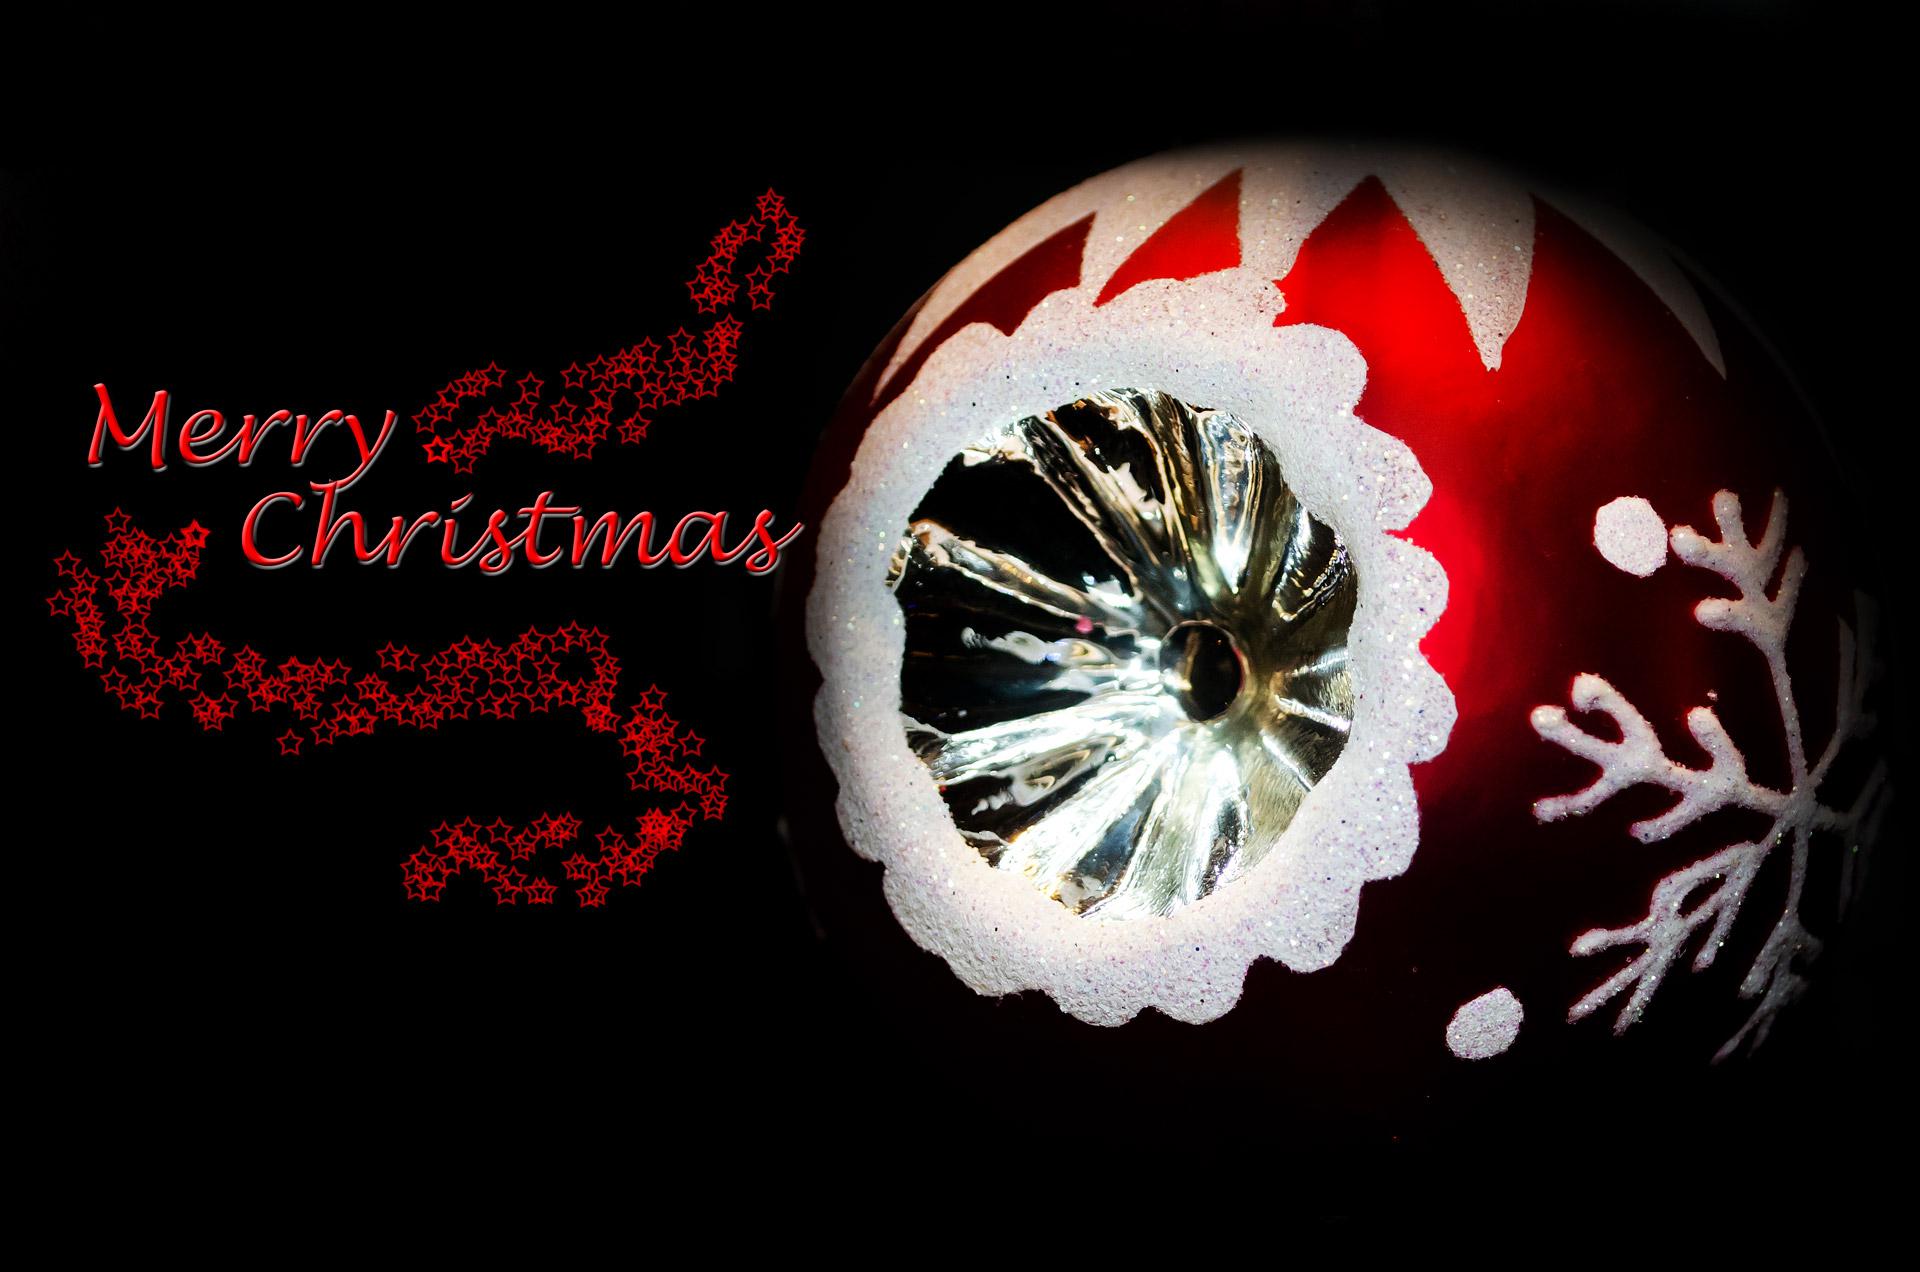 Merry Christmas free image